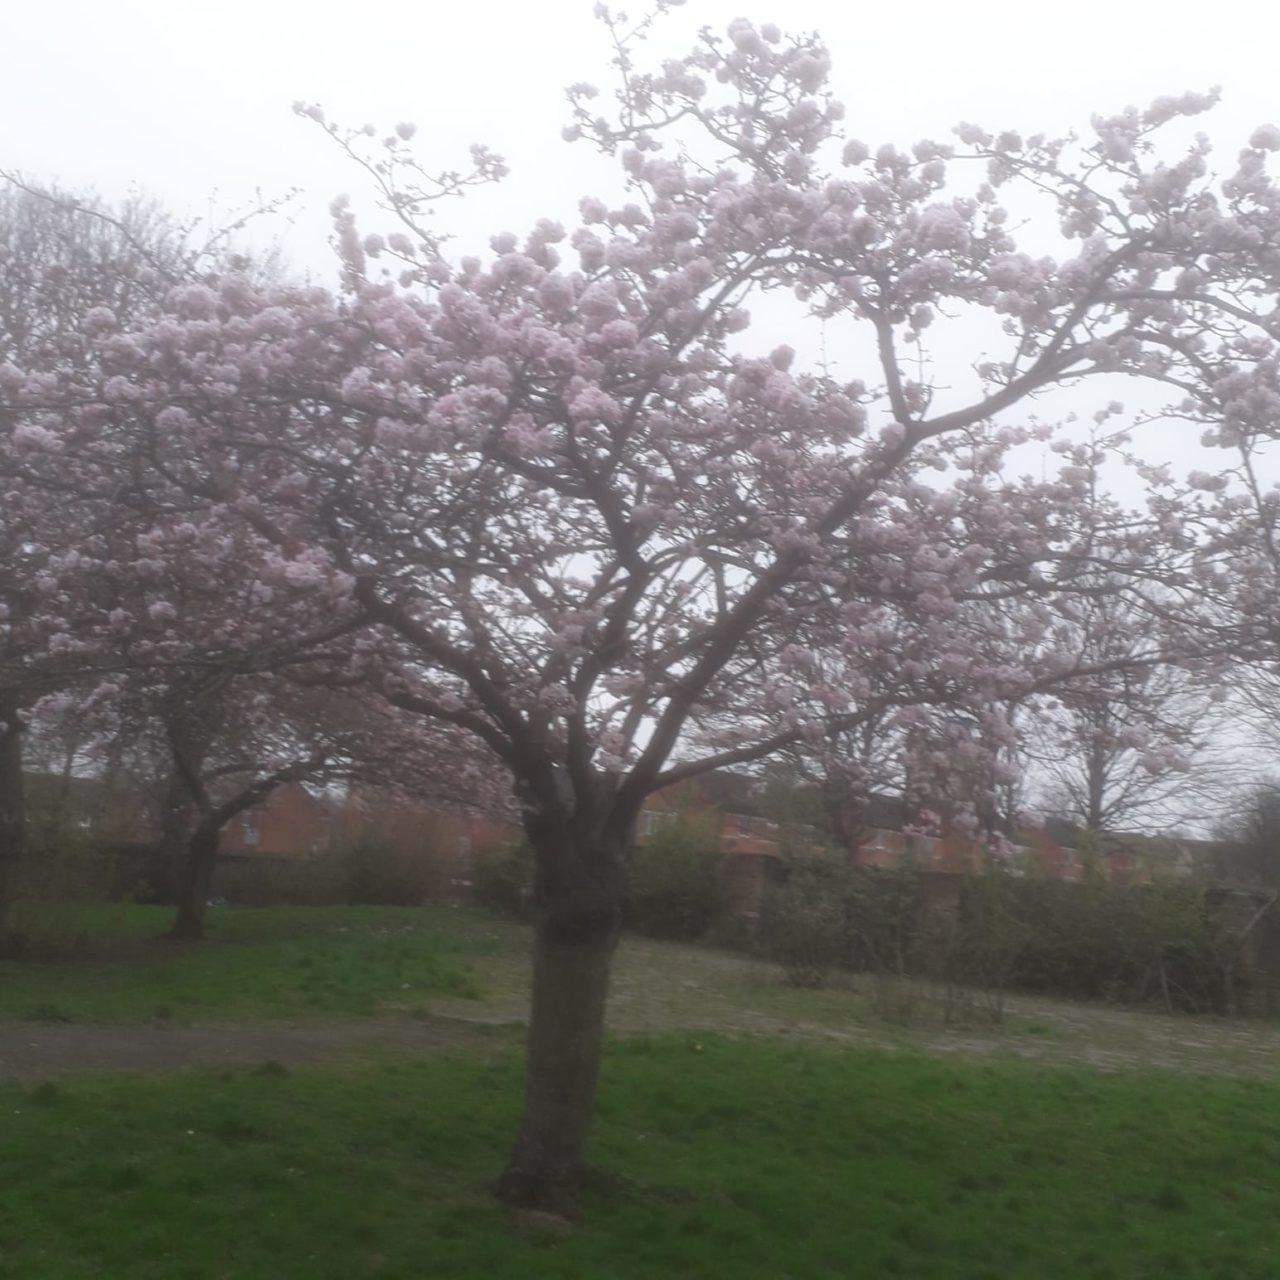 fully blossomed tree